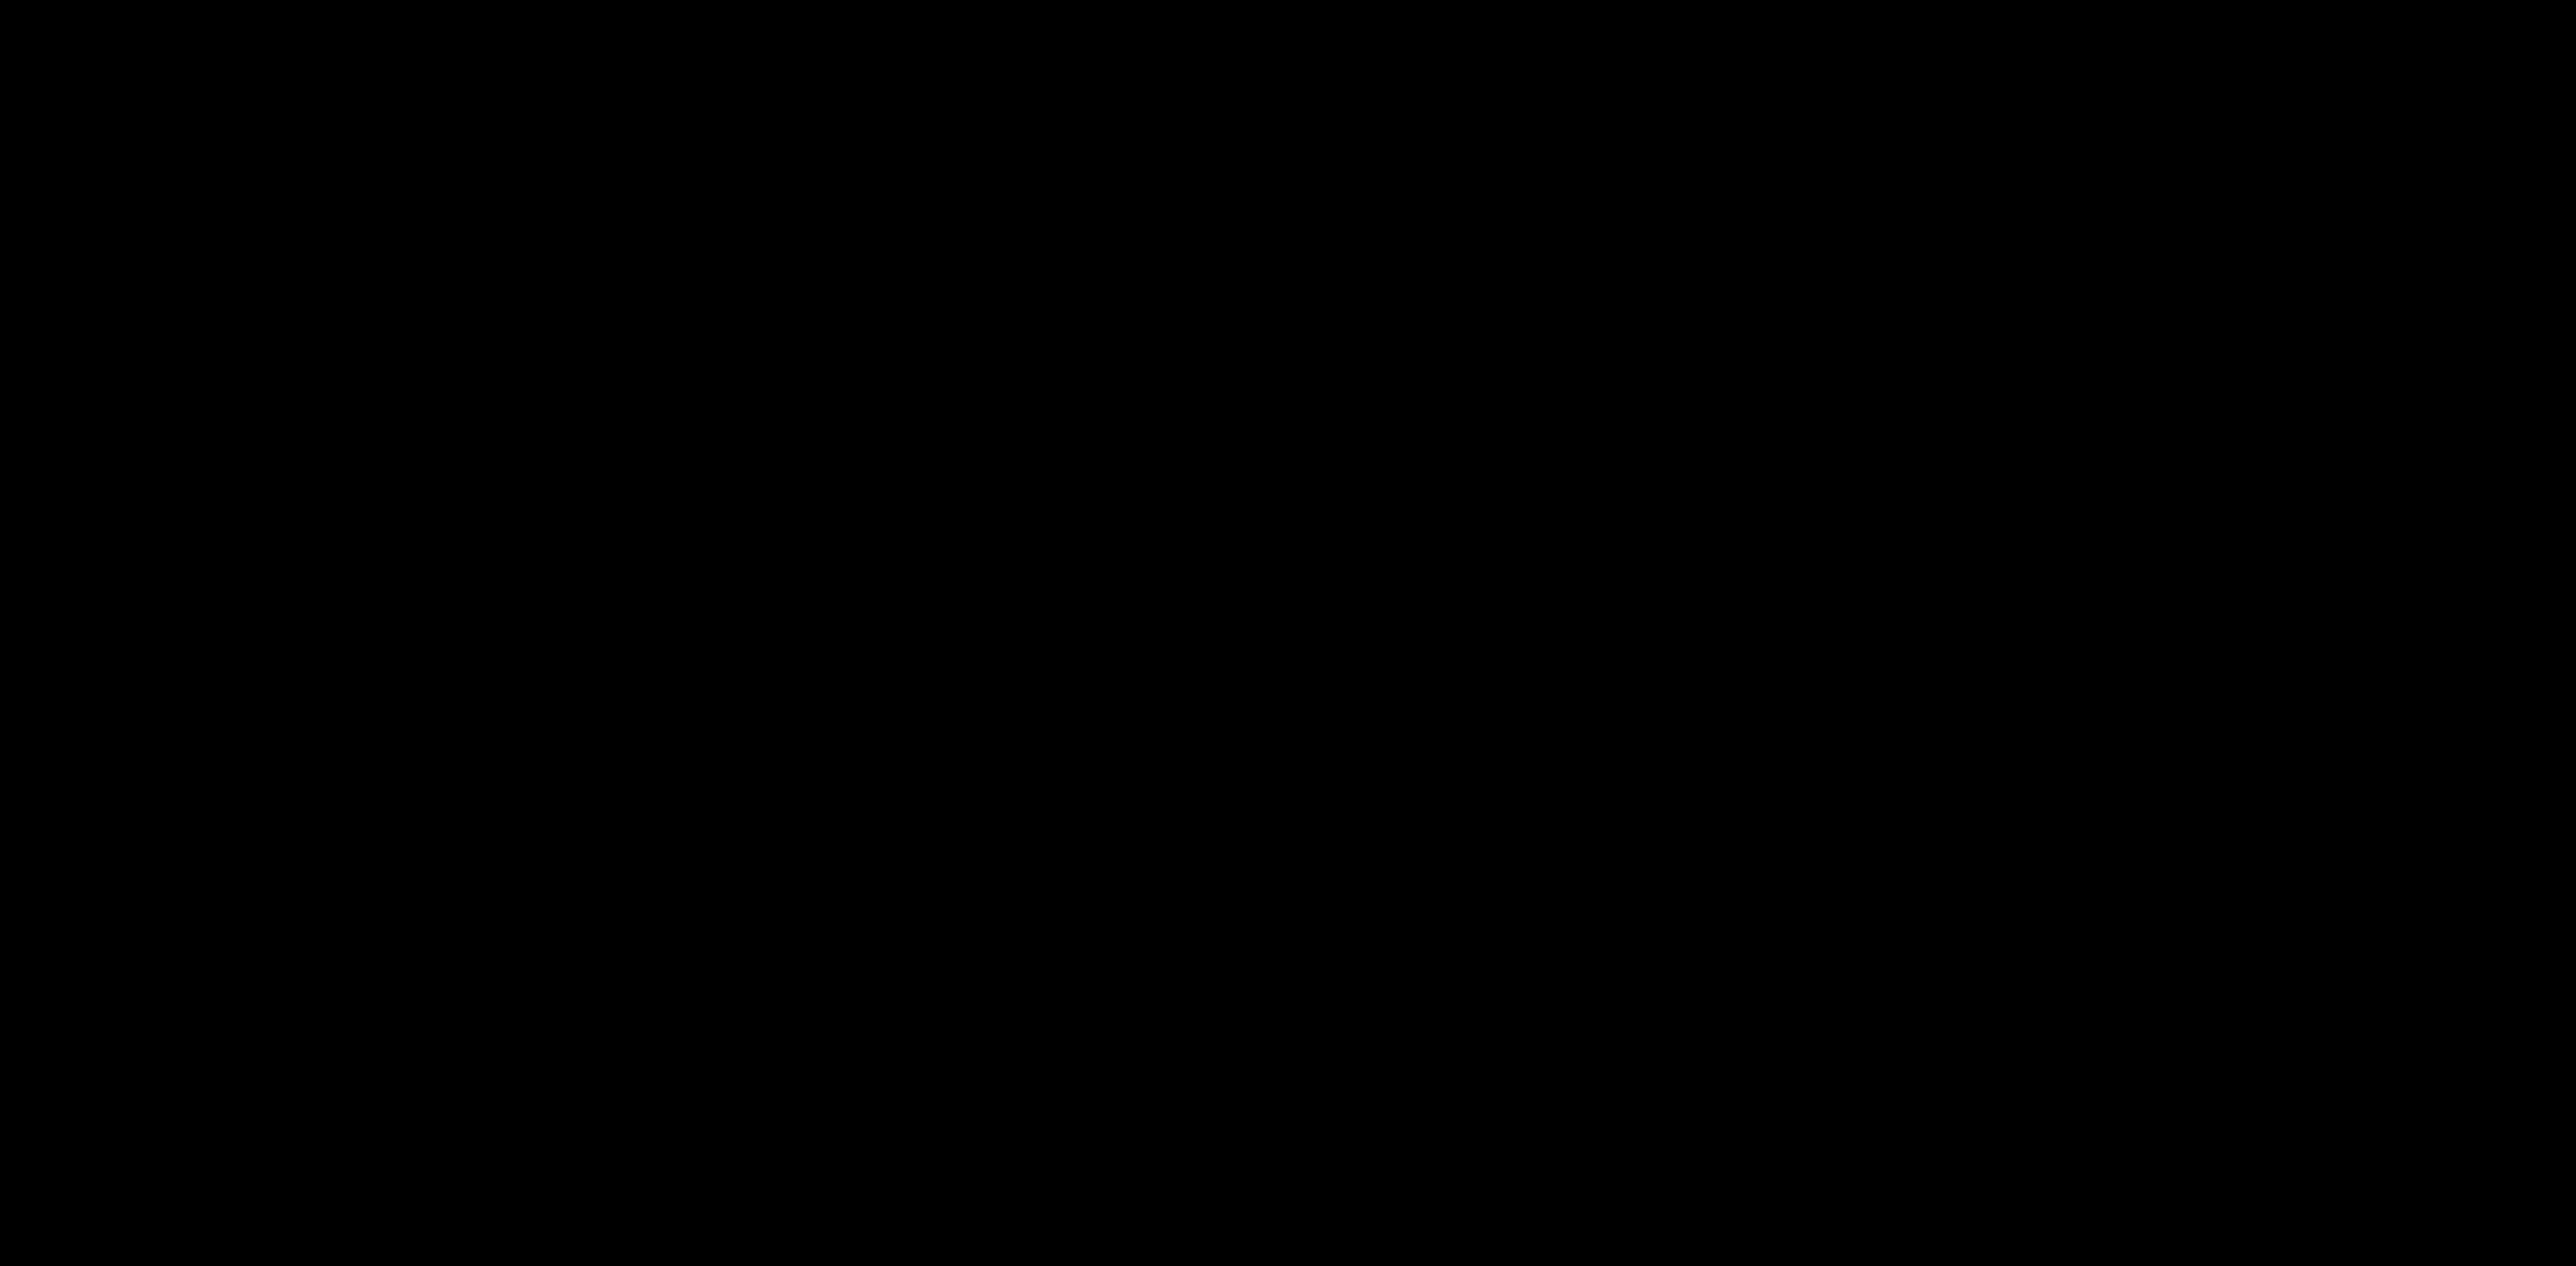 18048-06-1